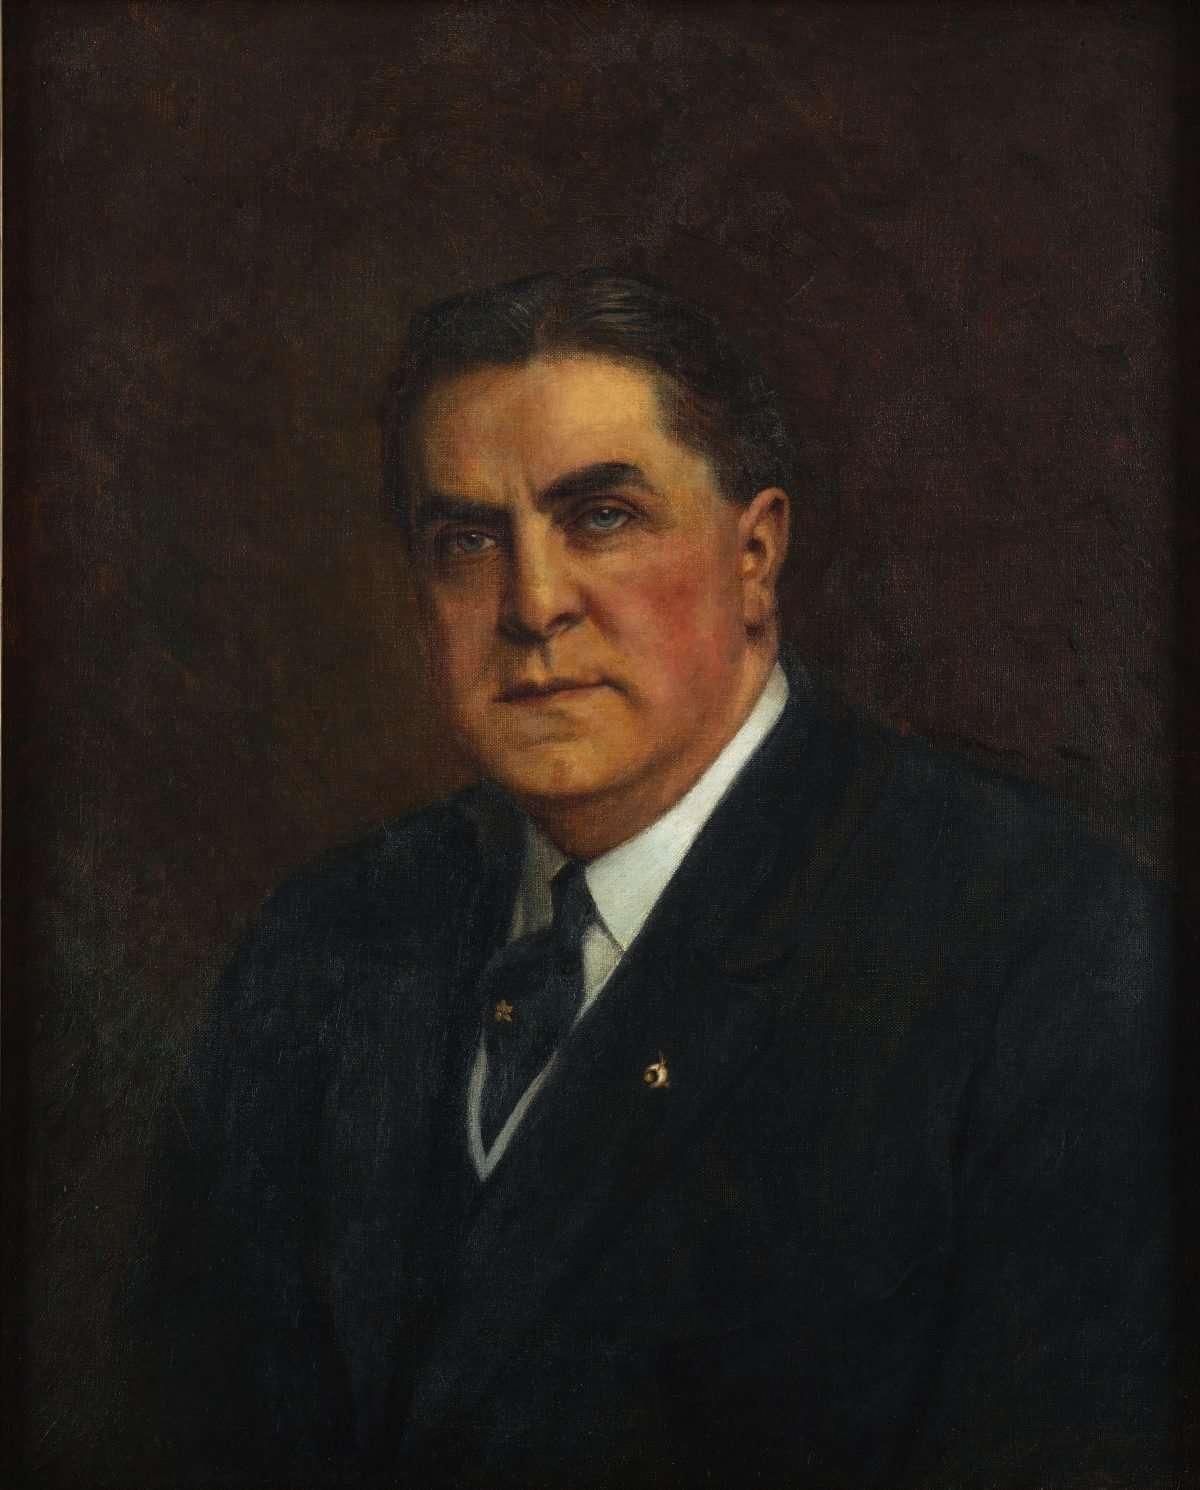 E. Lee Trinkle